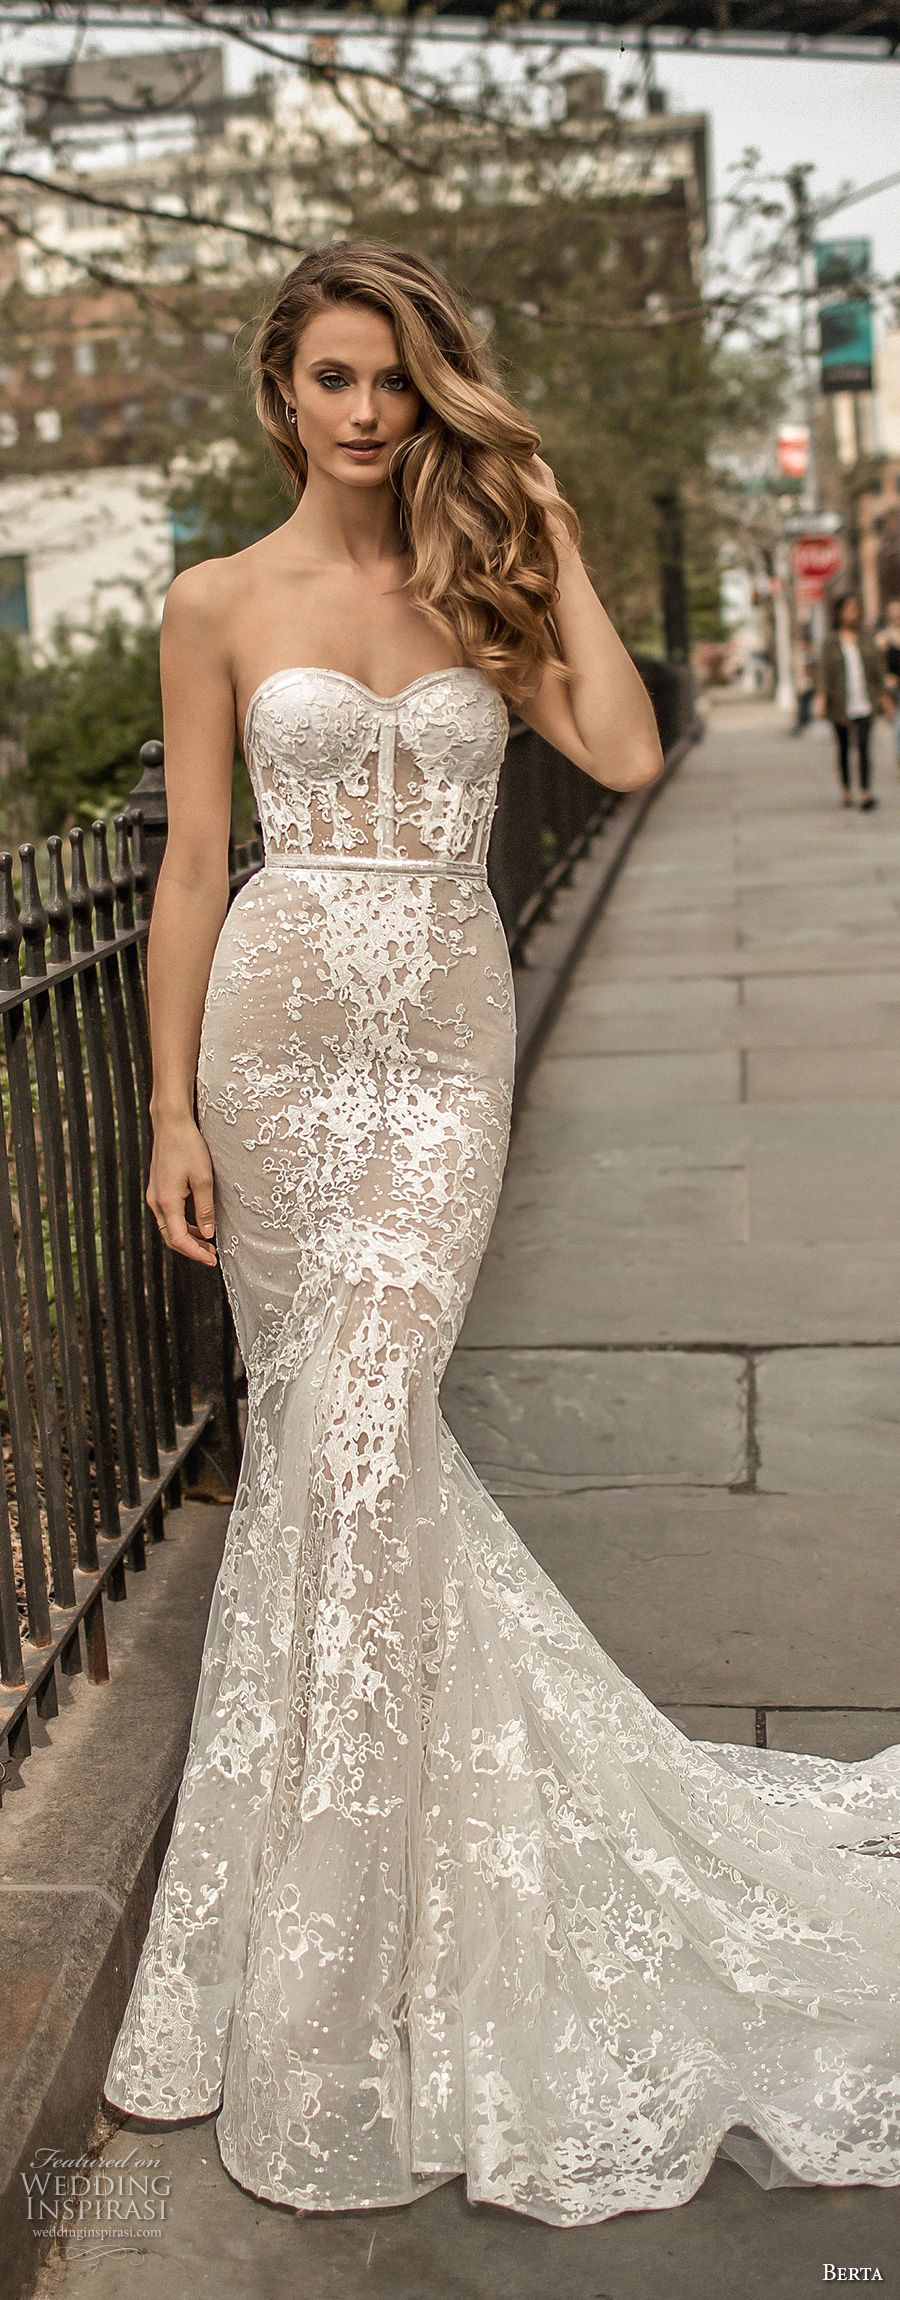 Berta spring wedding dresses u campaign photos latest